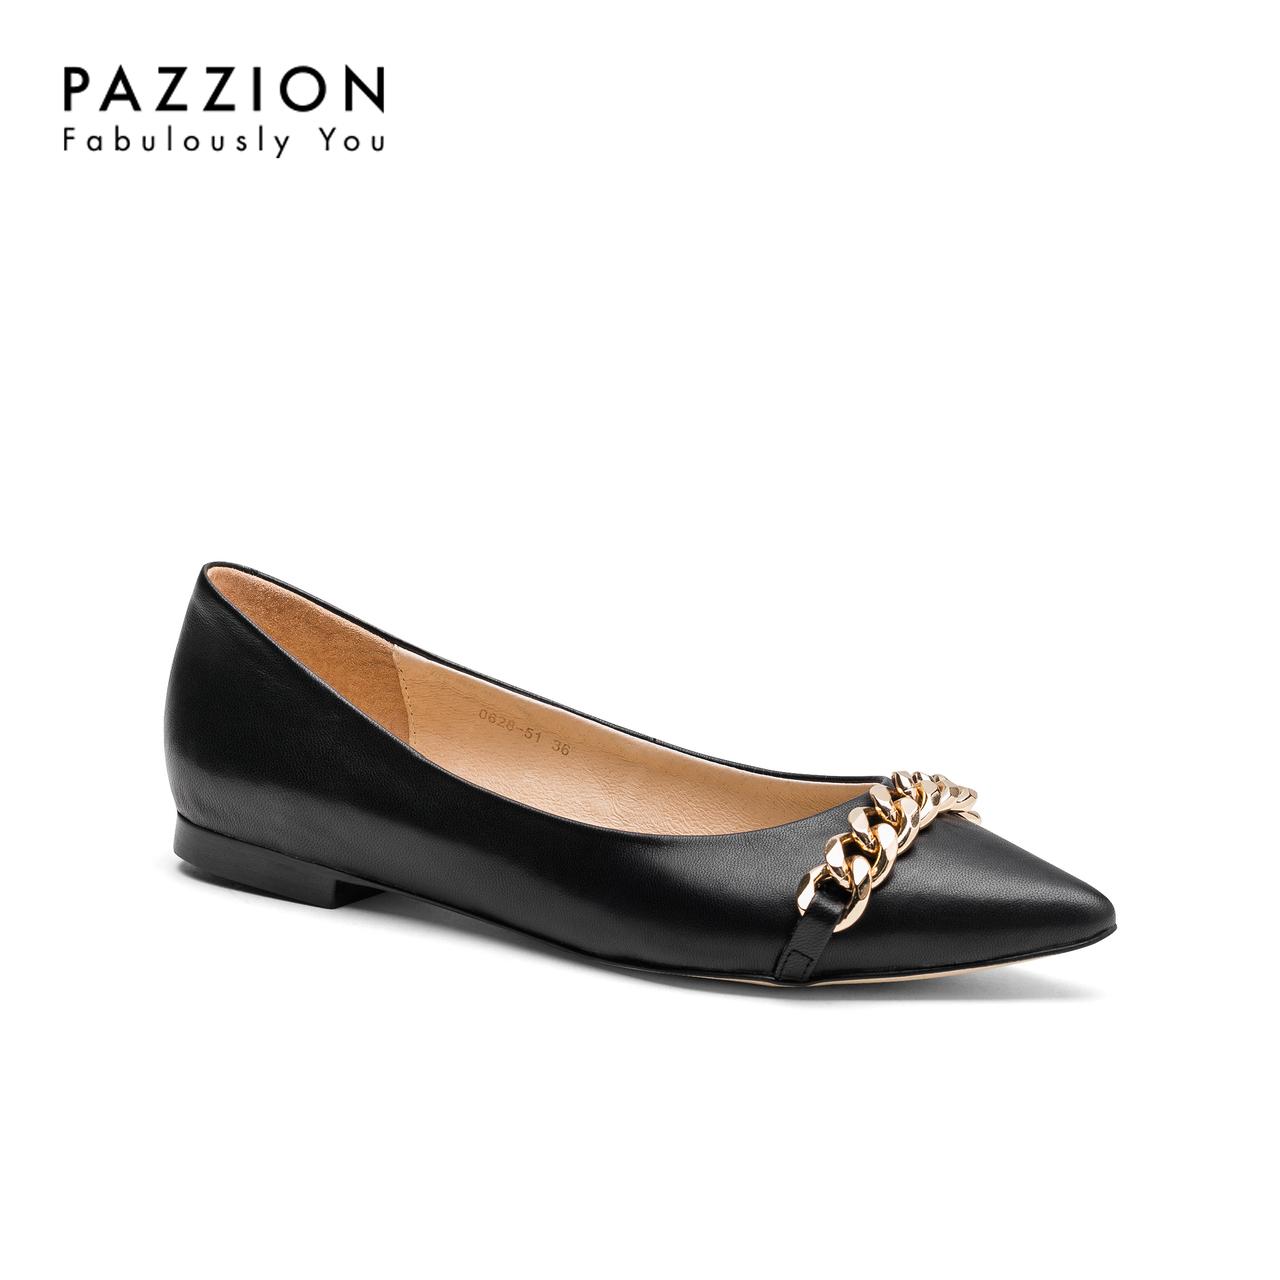 PAZZION潮流金属链条尖头通勤女鞋 休闲舒适柔软浅口平底羊皮单鞋